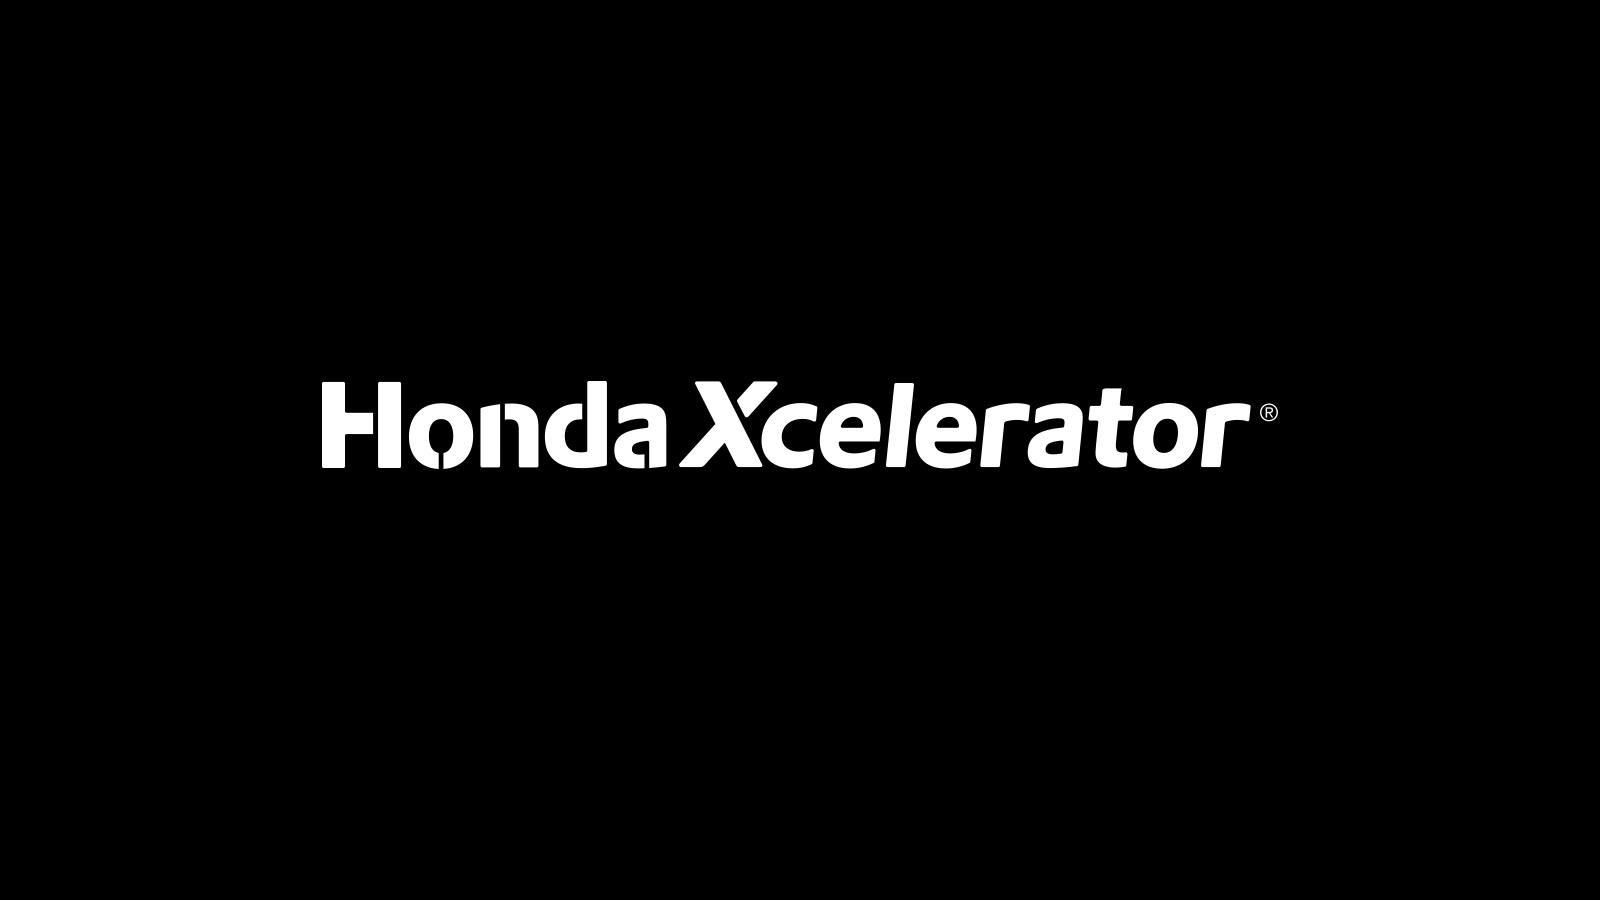 honda_xcelerator.png